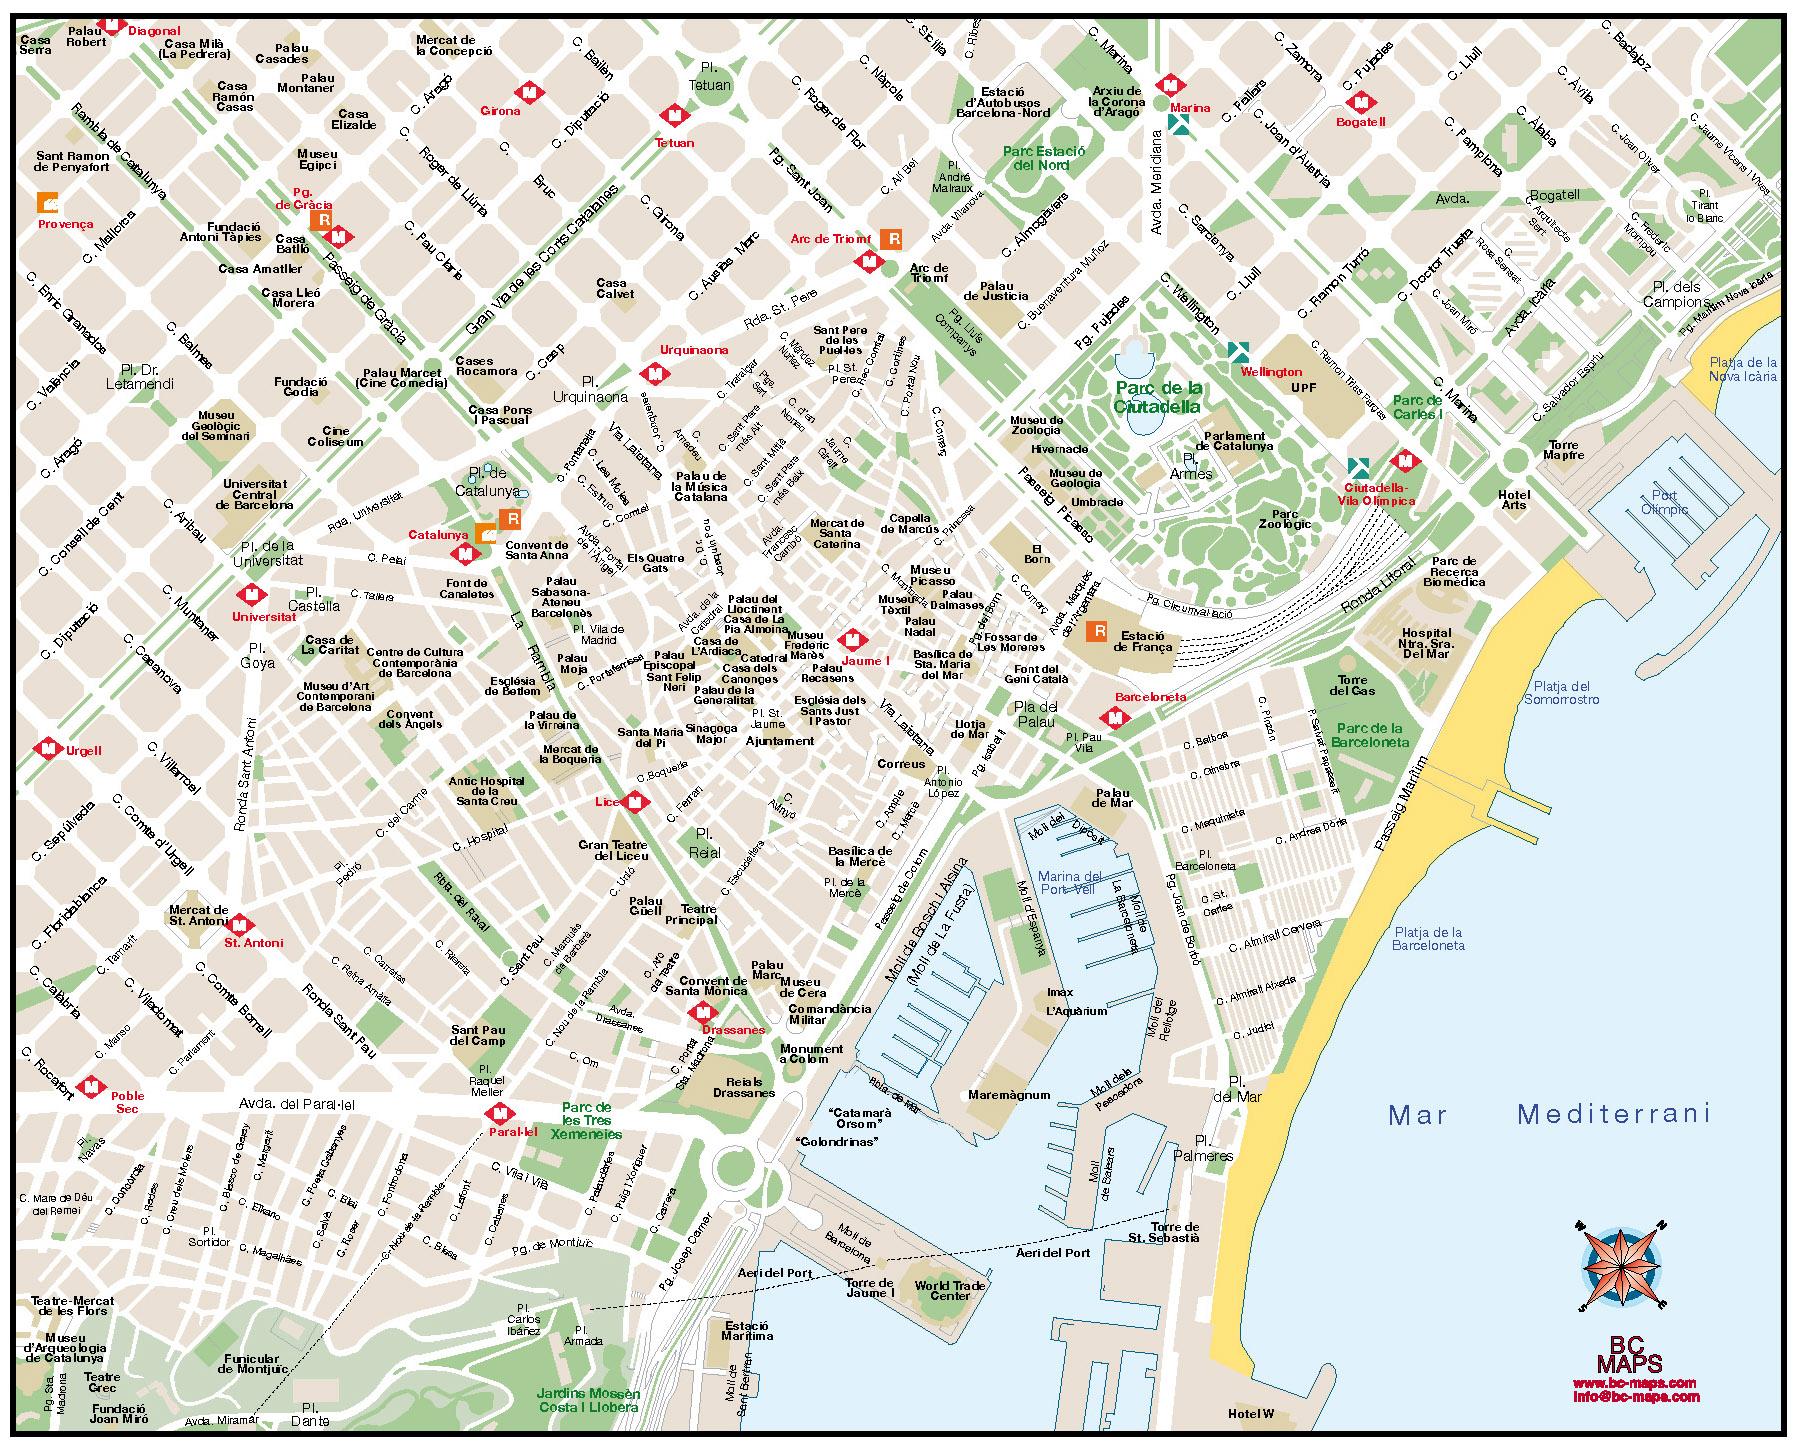 Mapa Turistico De Barcelona Mapa Owje Com